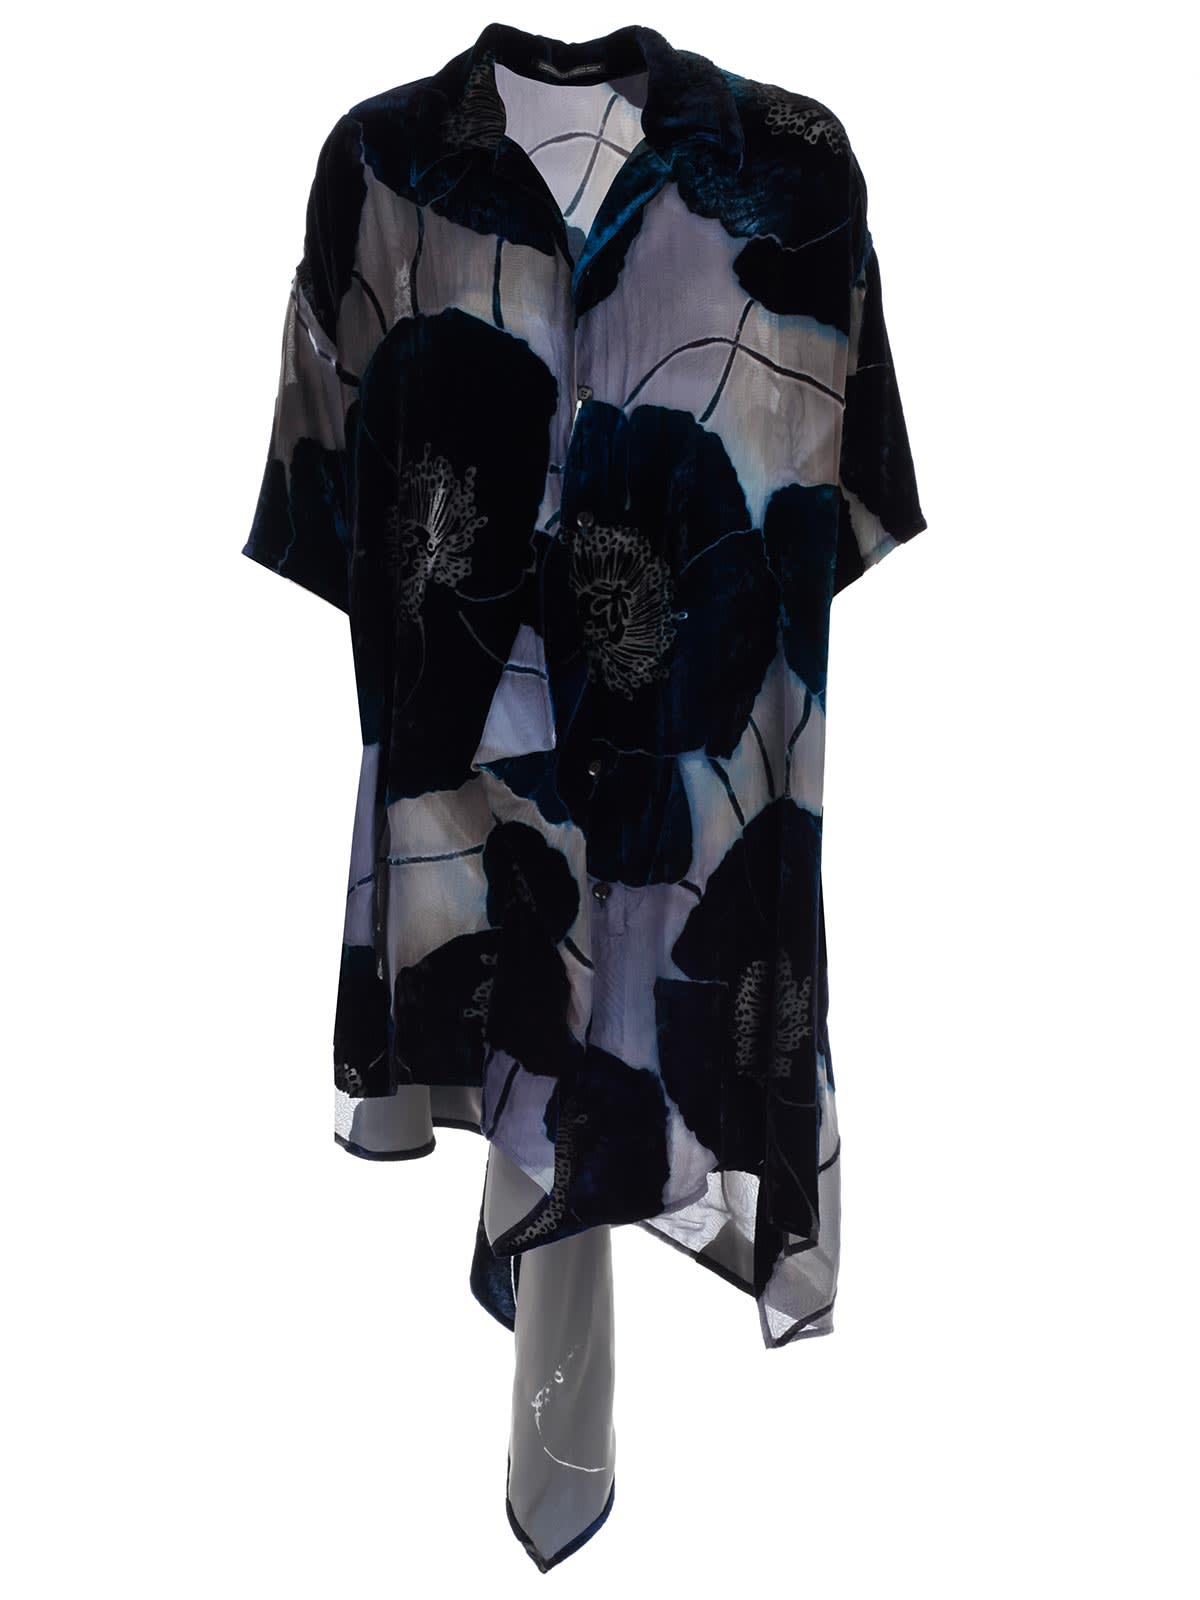 Yohji Yamamoto Floral Applique Shirt Dress